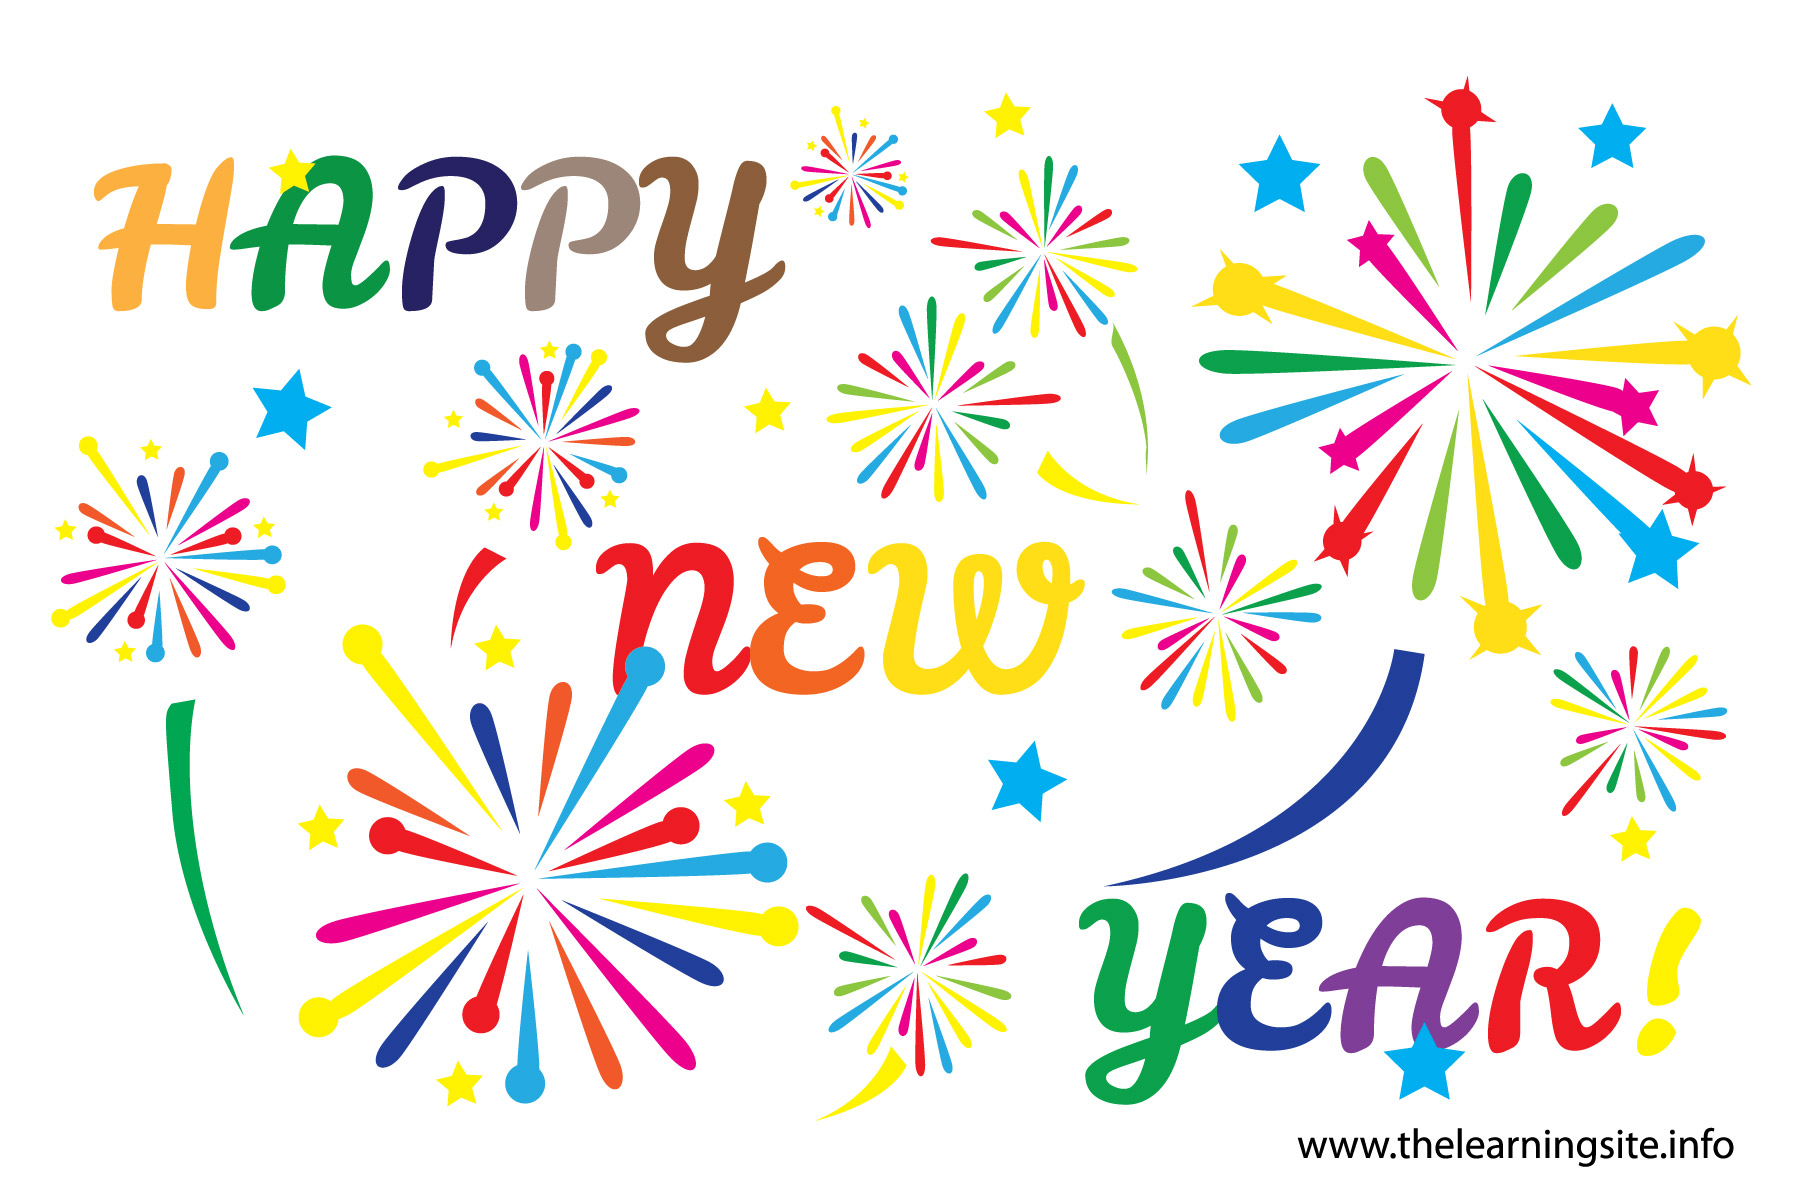 Happy New Year Clipart - .-Happy New Year Clipart - .-7